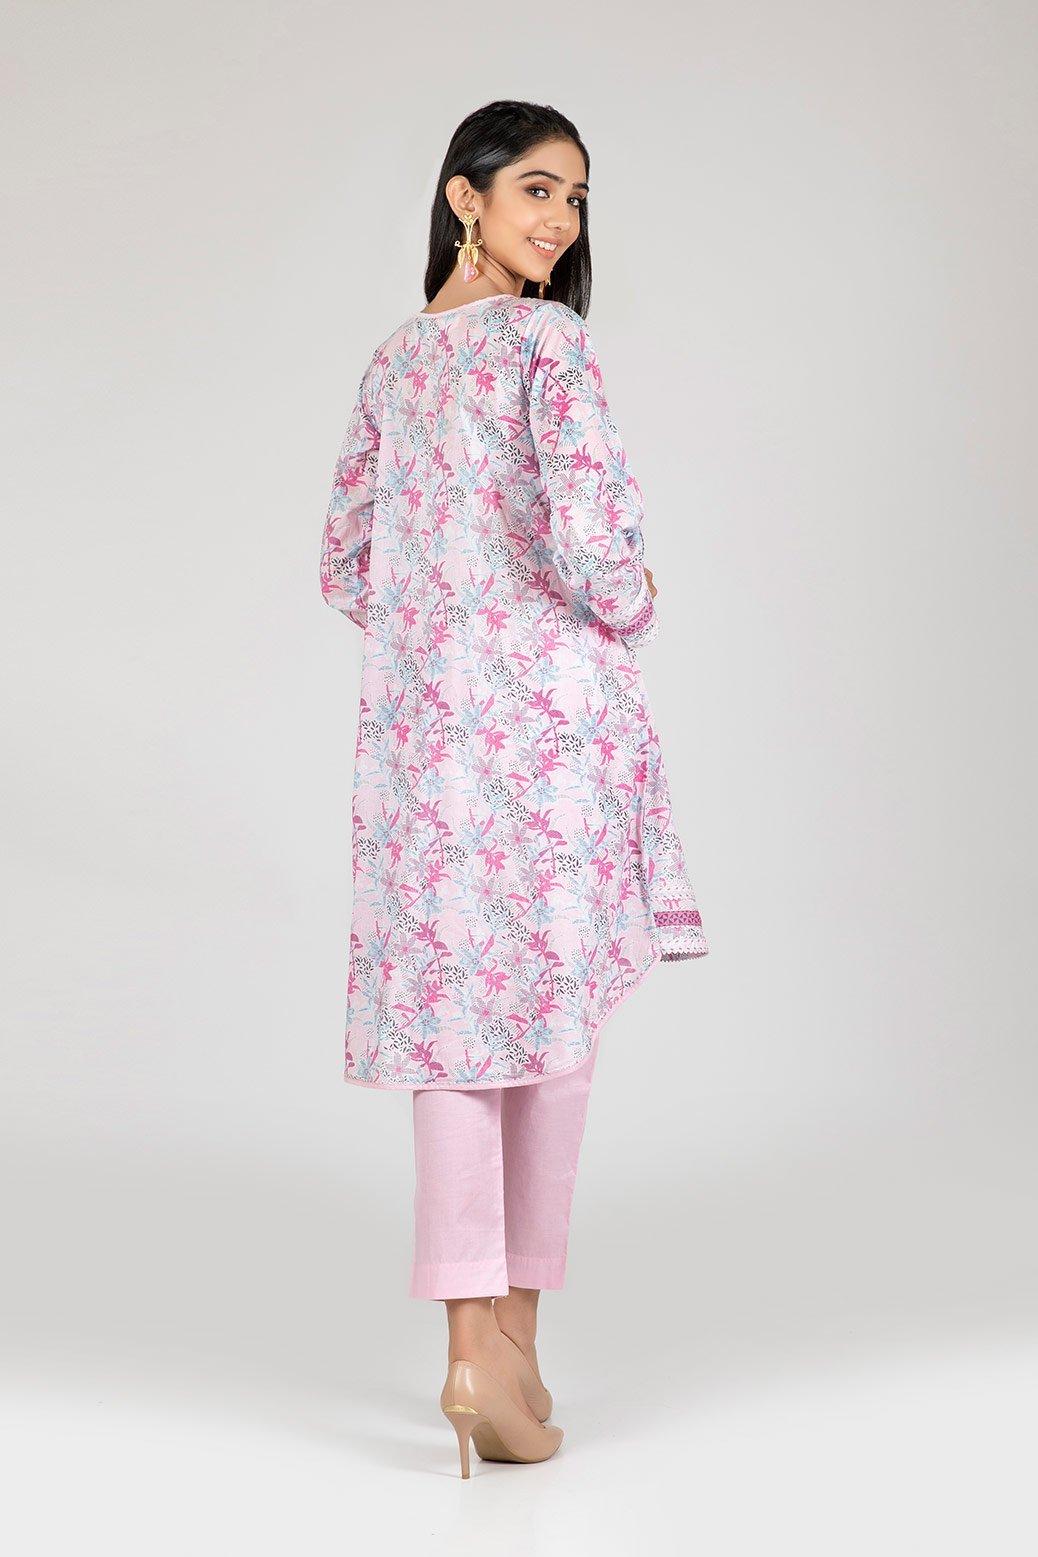 Bonanza Satrangi two piece dress Pink color back side